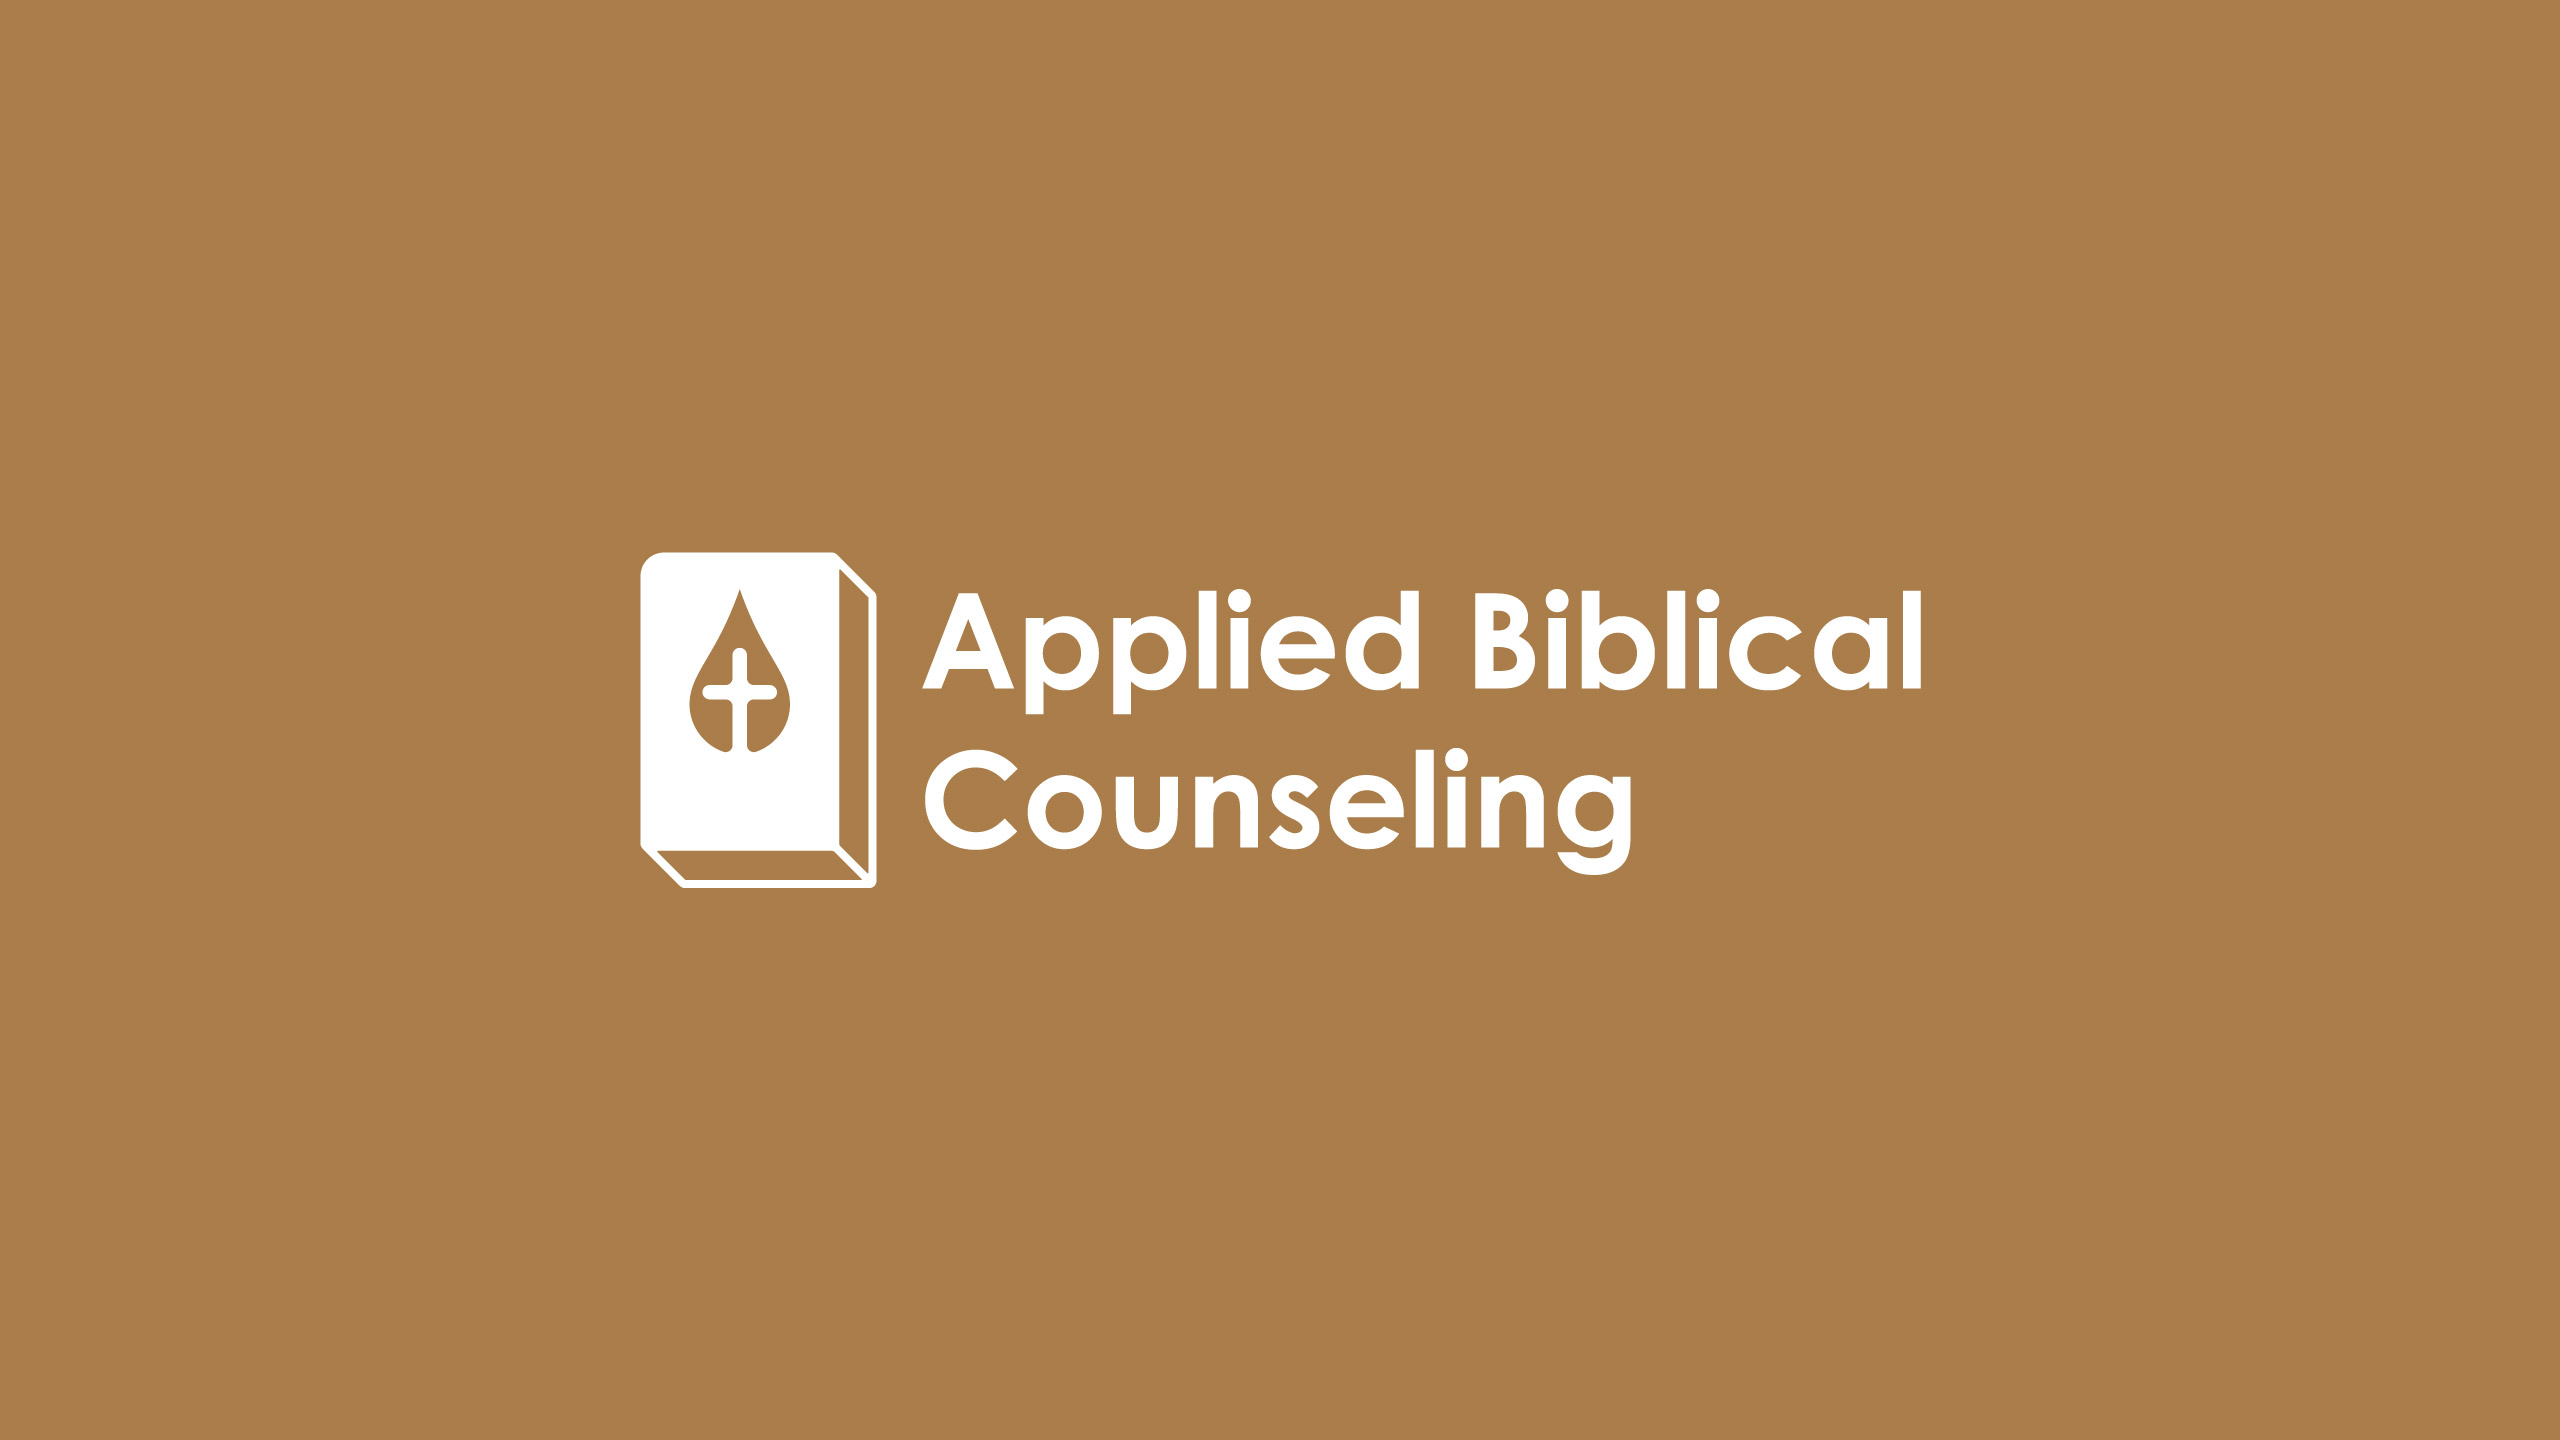 Biblical counseling logo design